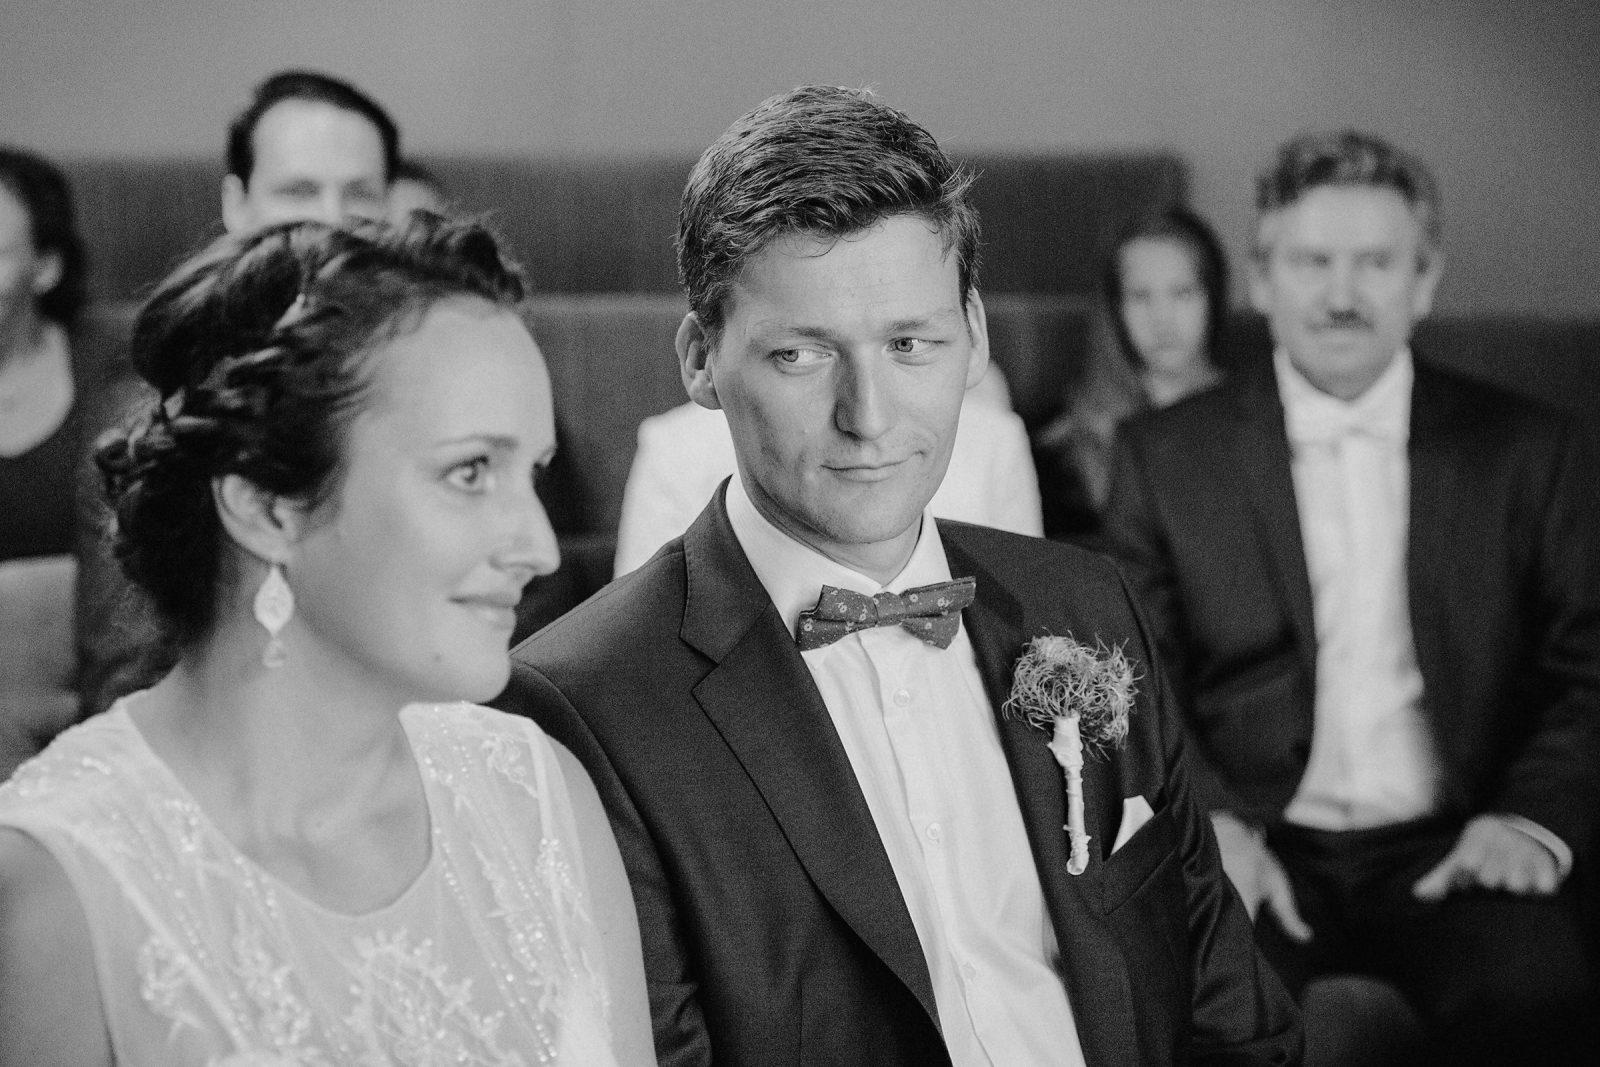 Hochzeit_Potsdam_fotograf_G7